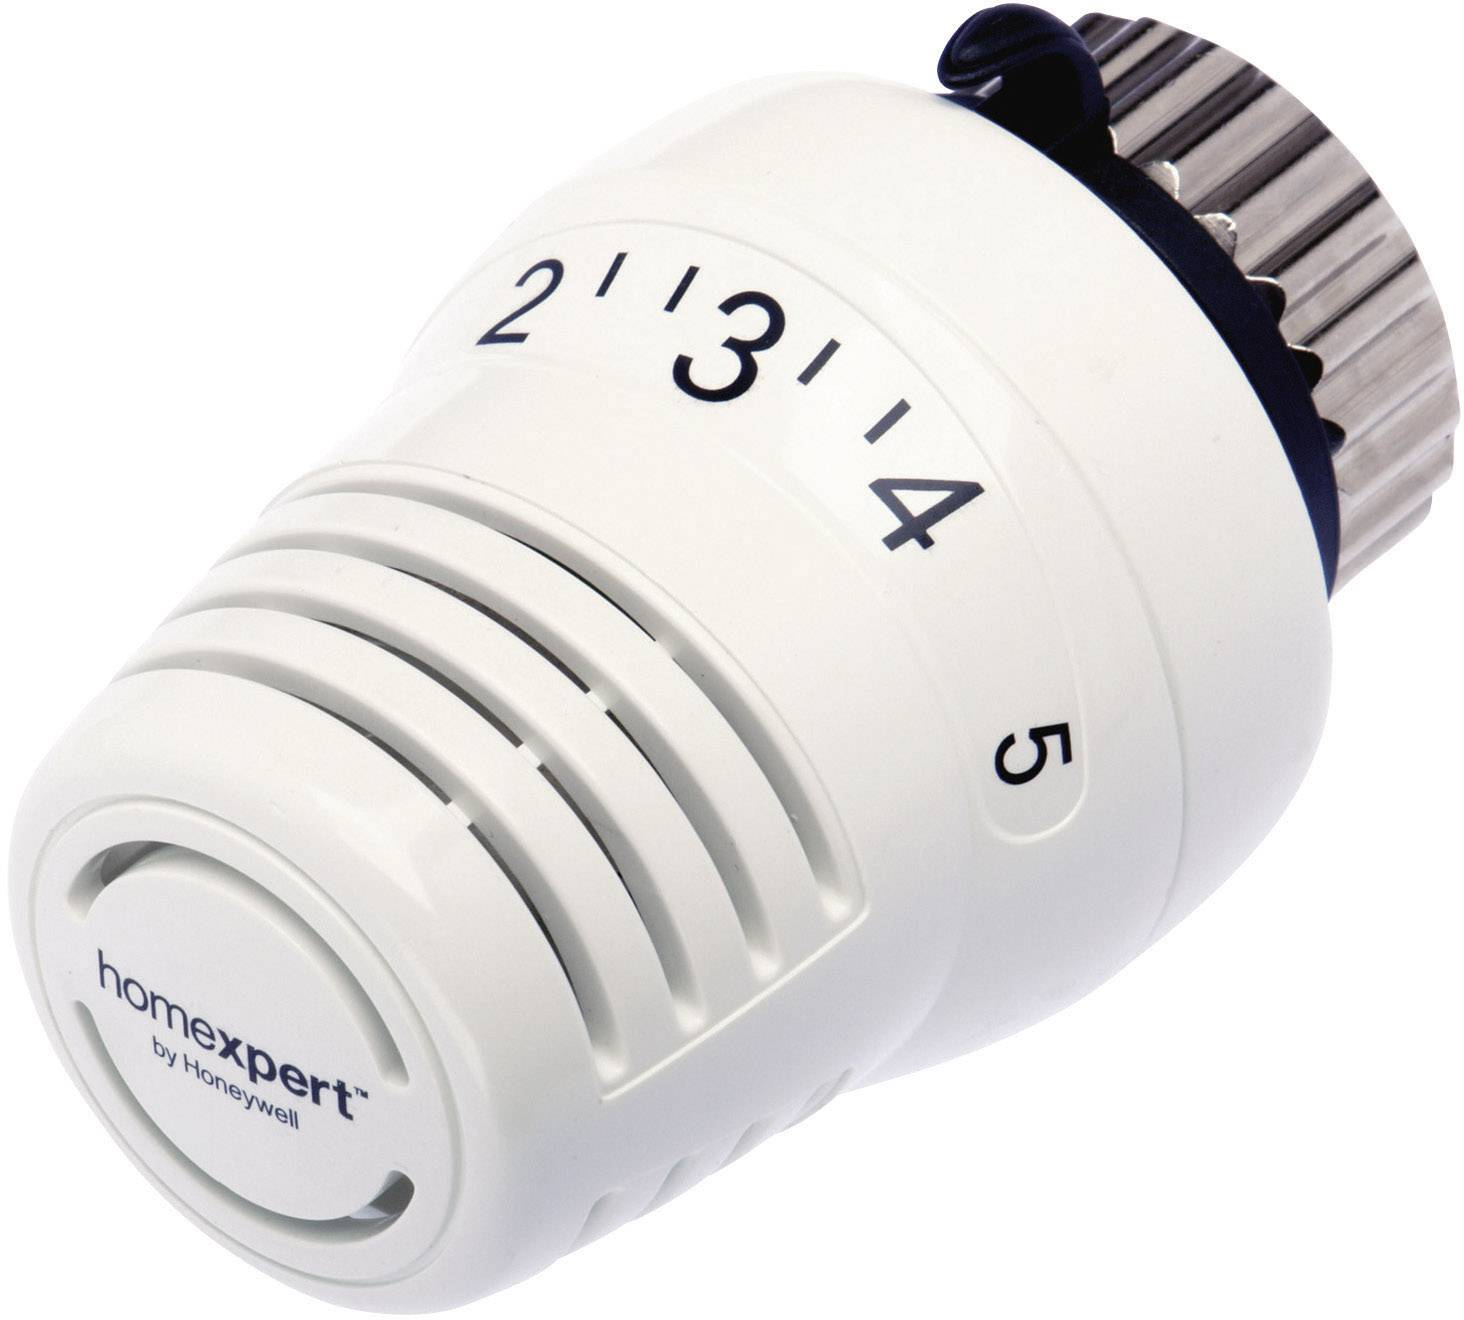 Radiátorová termostatická hlavica Homexpert by Honeywell THRM30W T5001RT, 6 do 28 °C